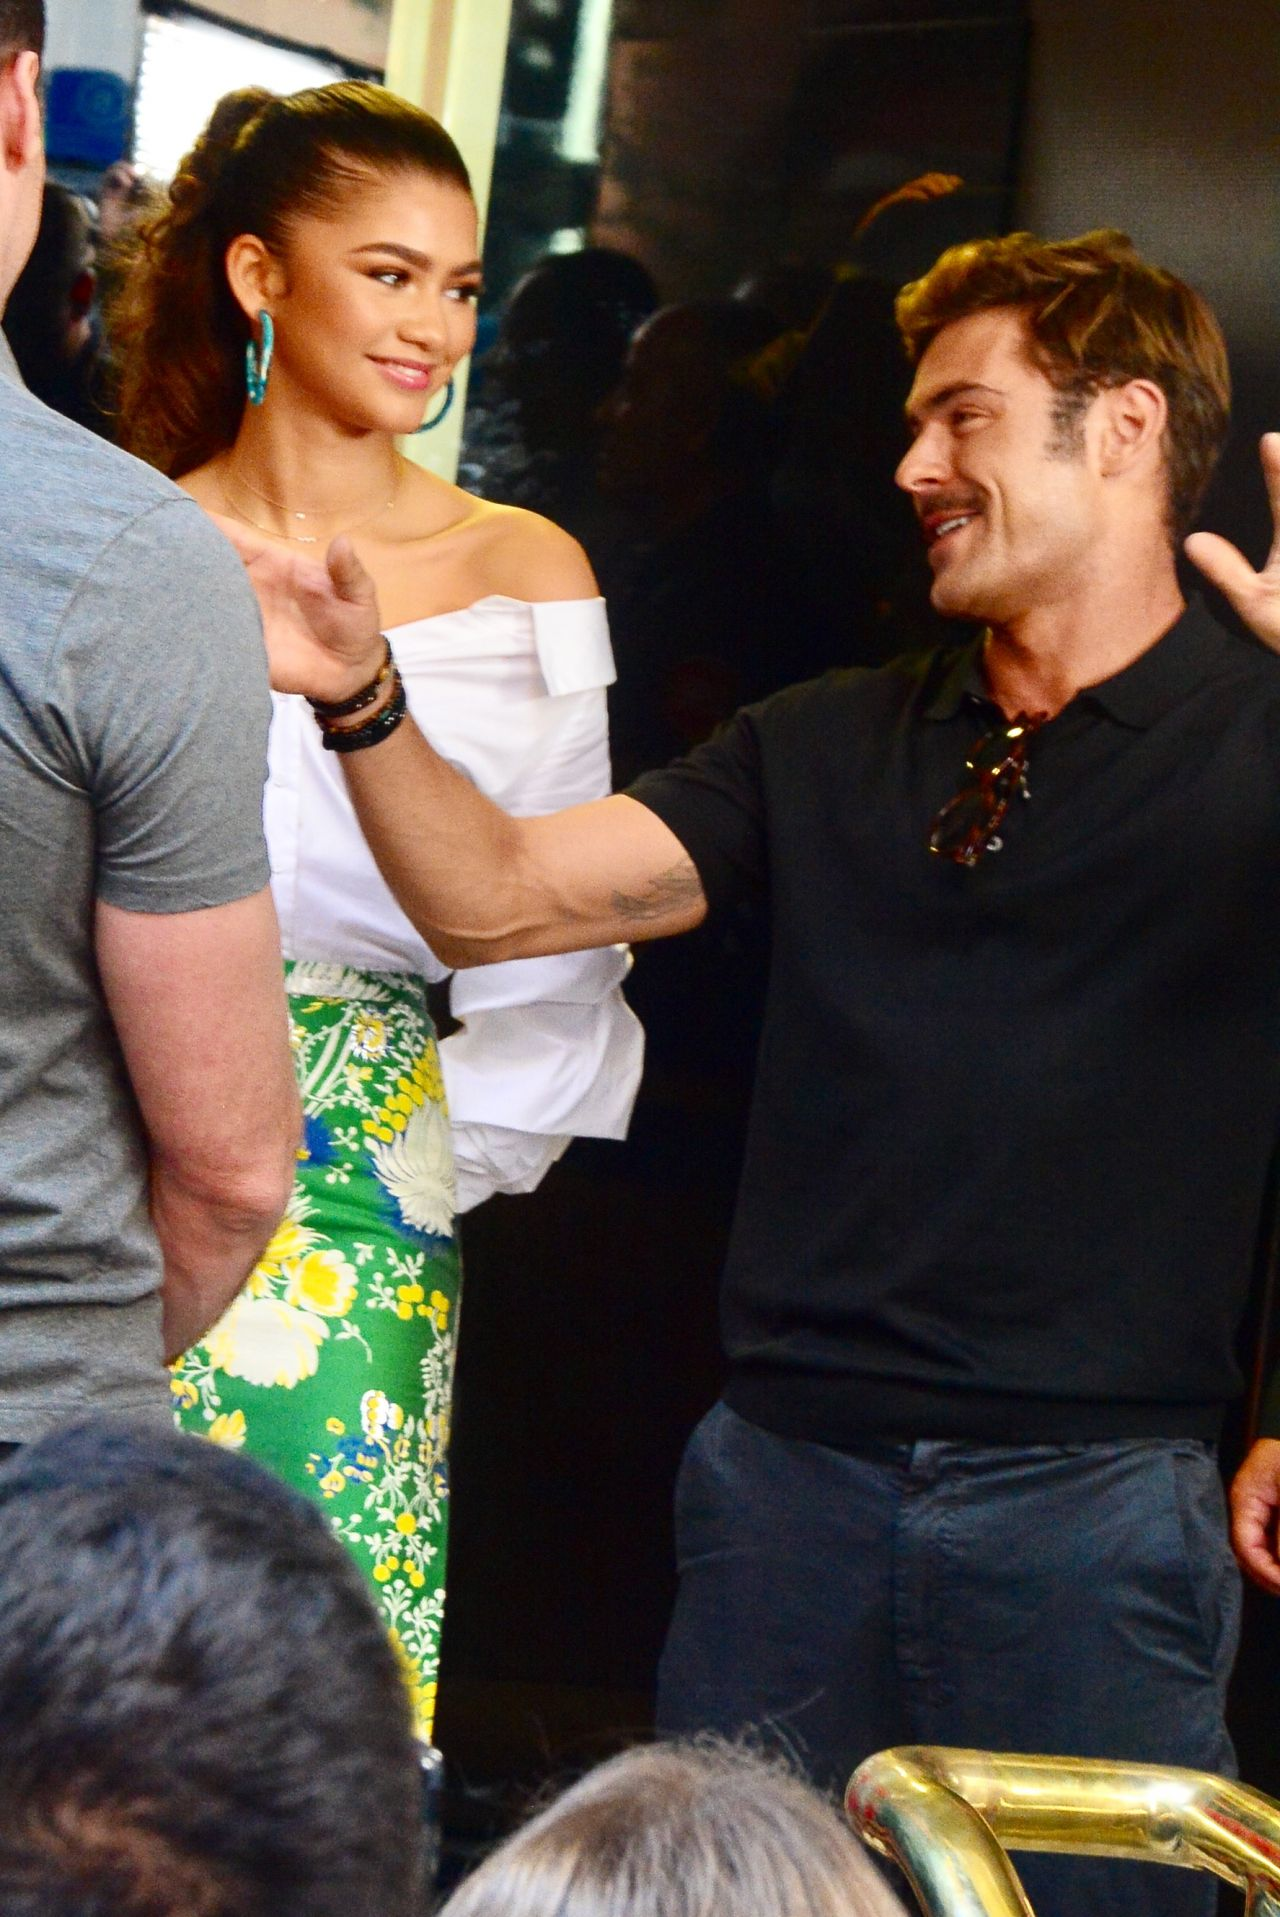 Zendaya Zac Efron and Hugh Jackman  Sunrise Show in Martin Place in Sydney